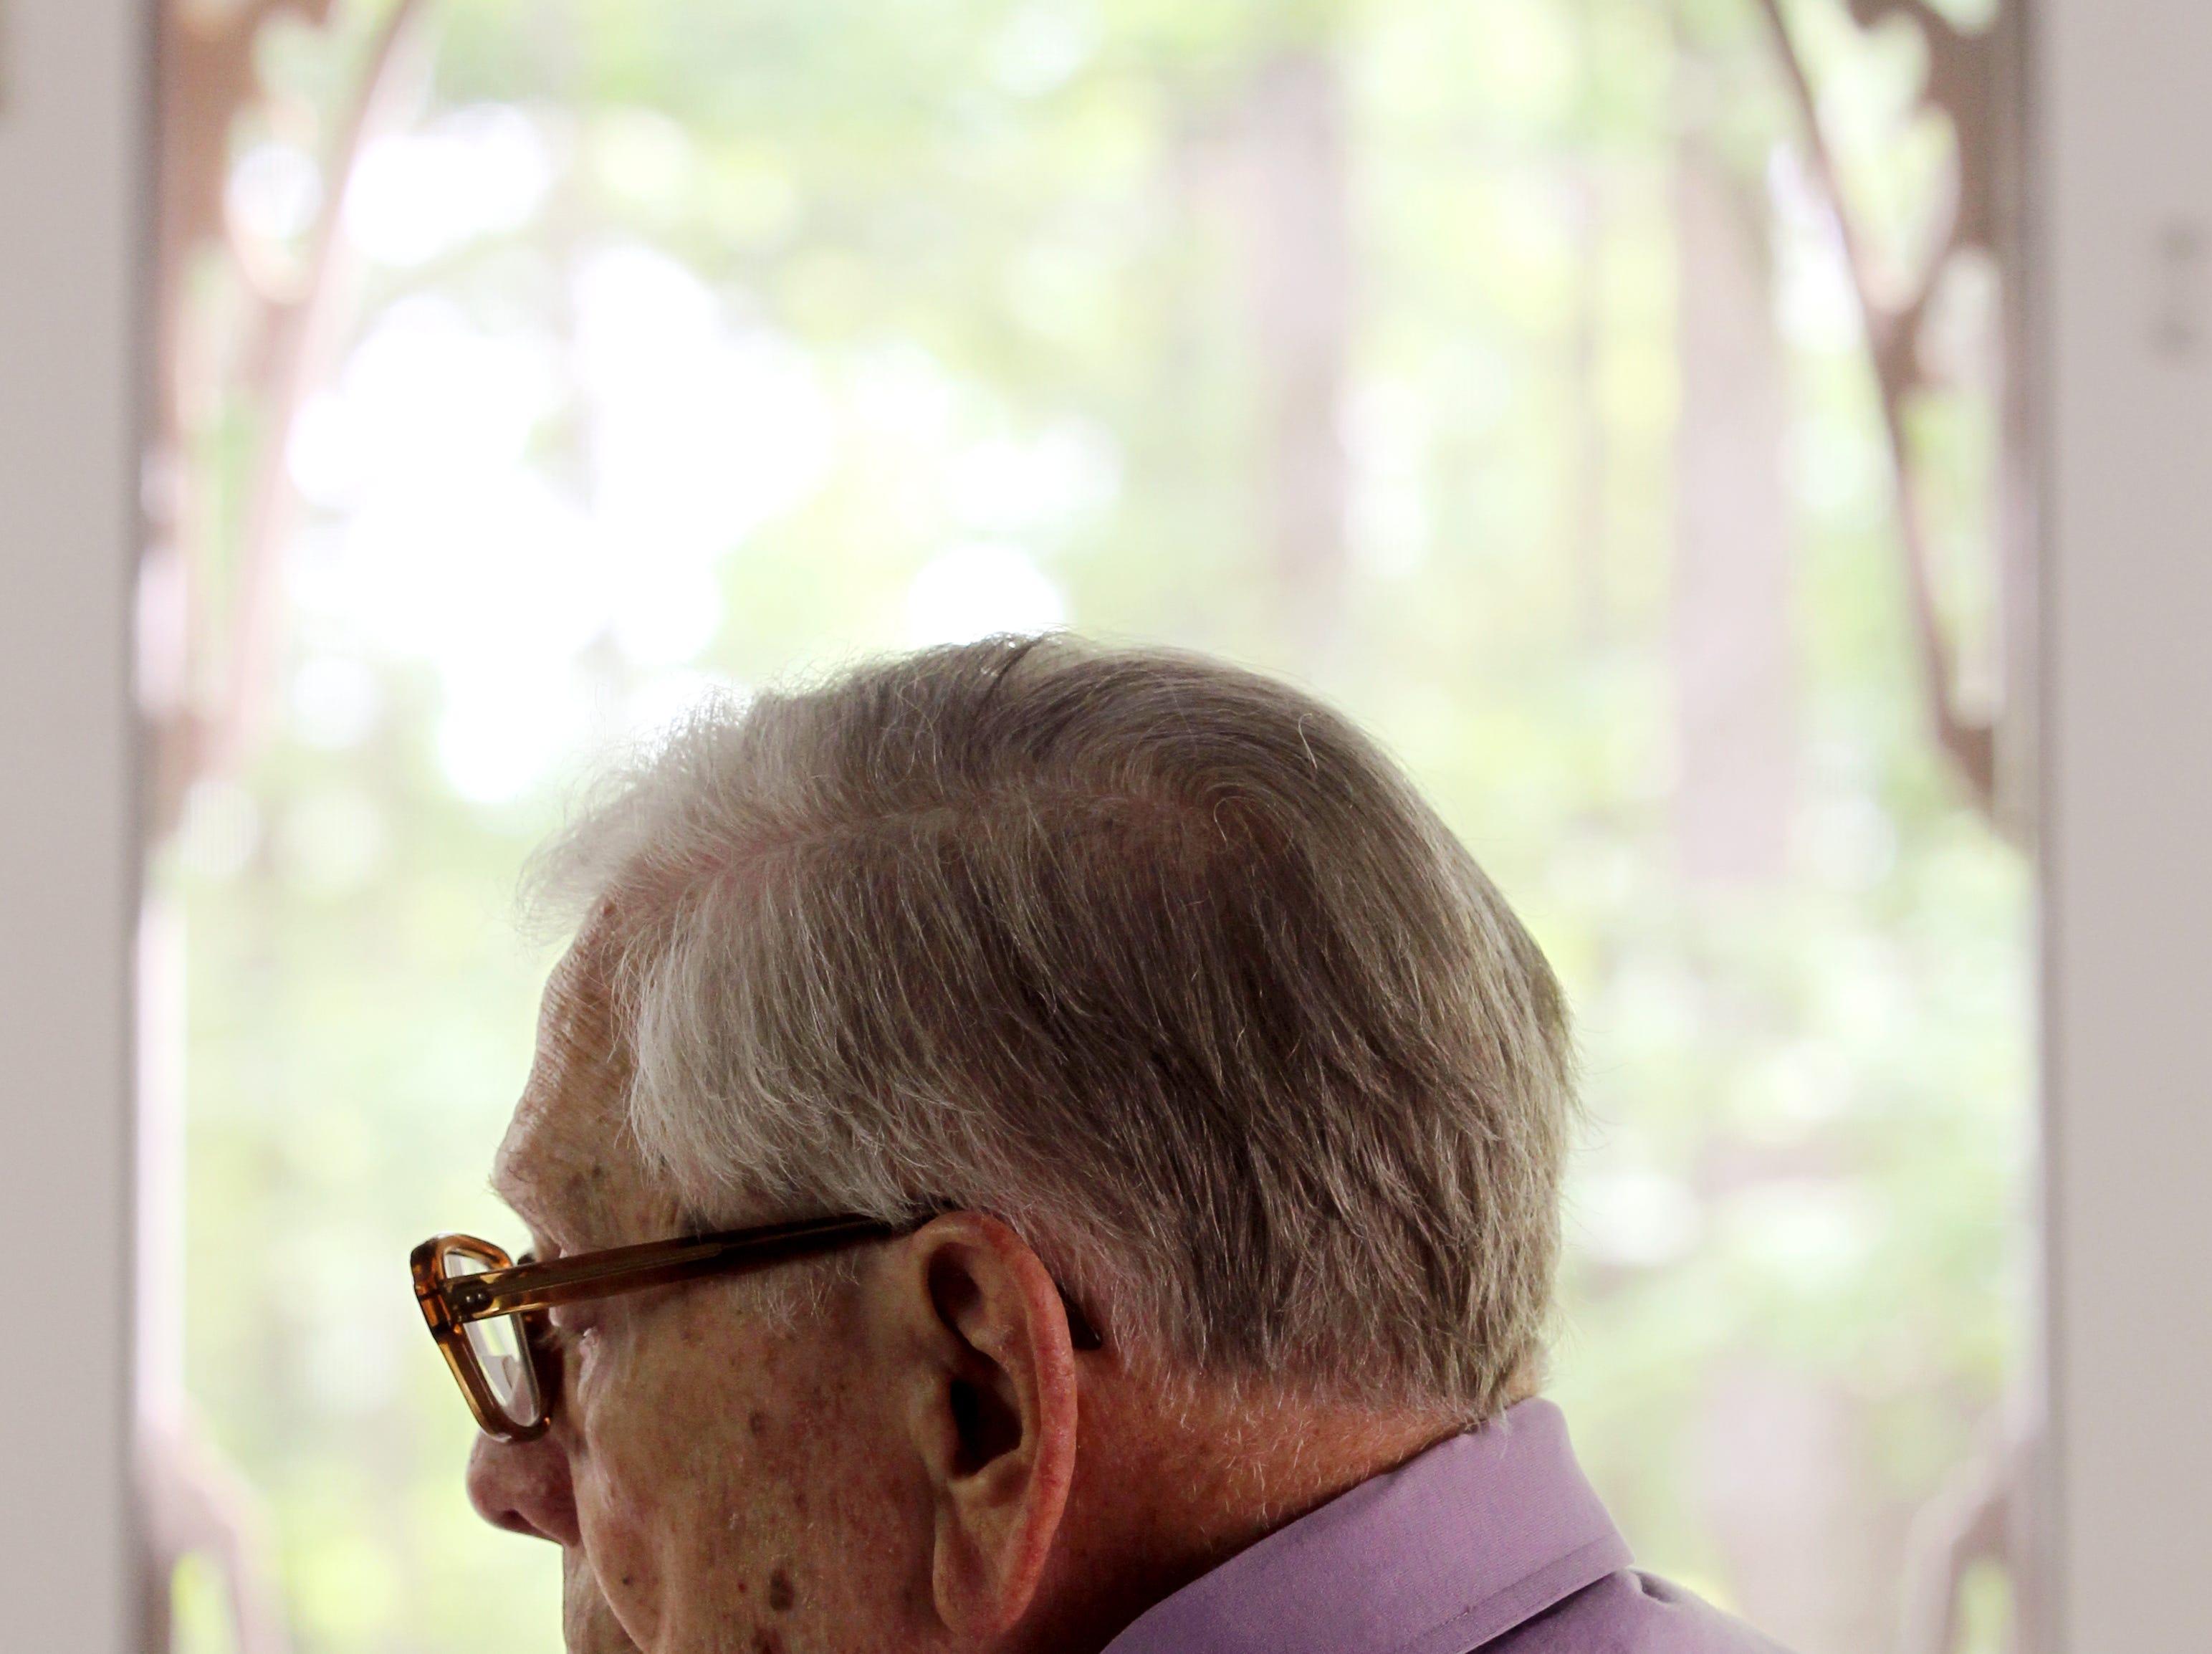 Ben Skardon, 94, reads the 18 minute speech he has written about surviving the Bataan Death March in the Phillipines during World War II.